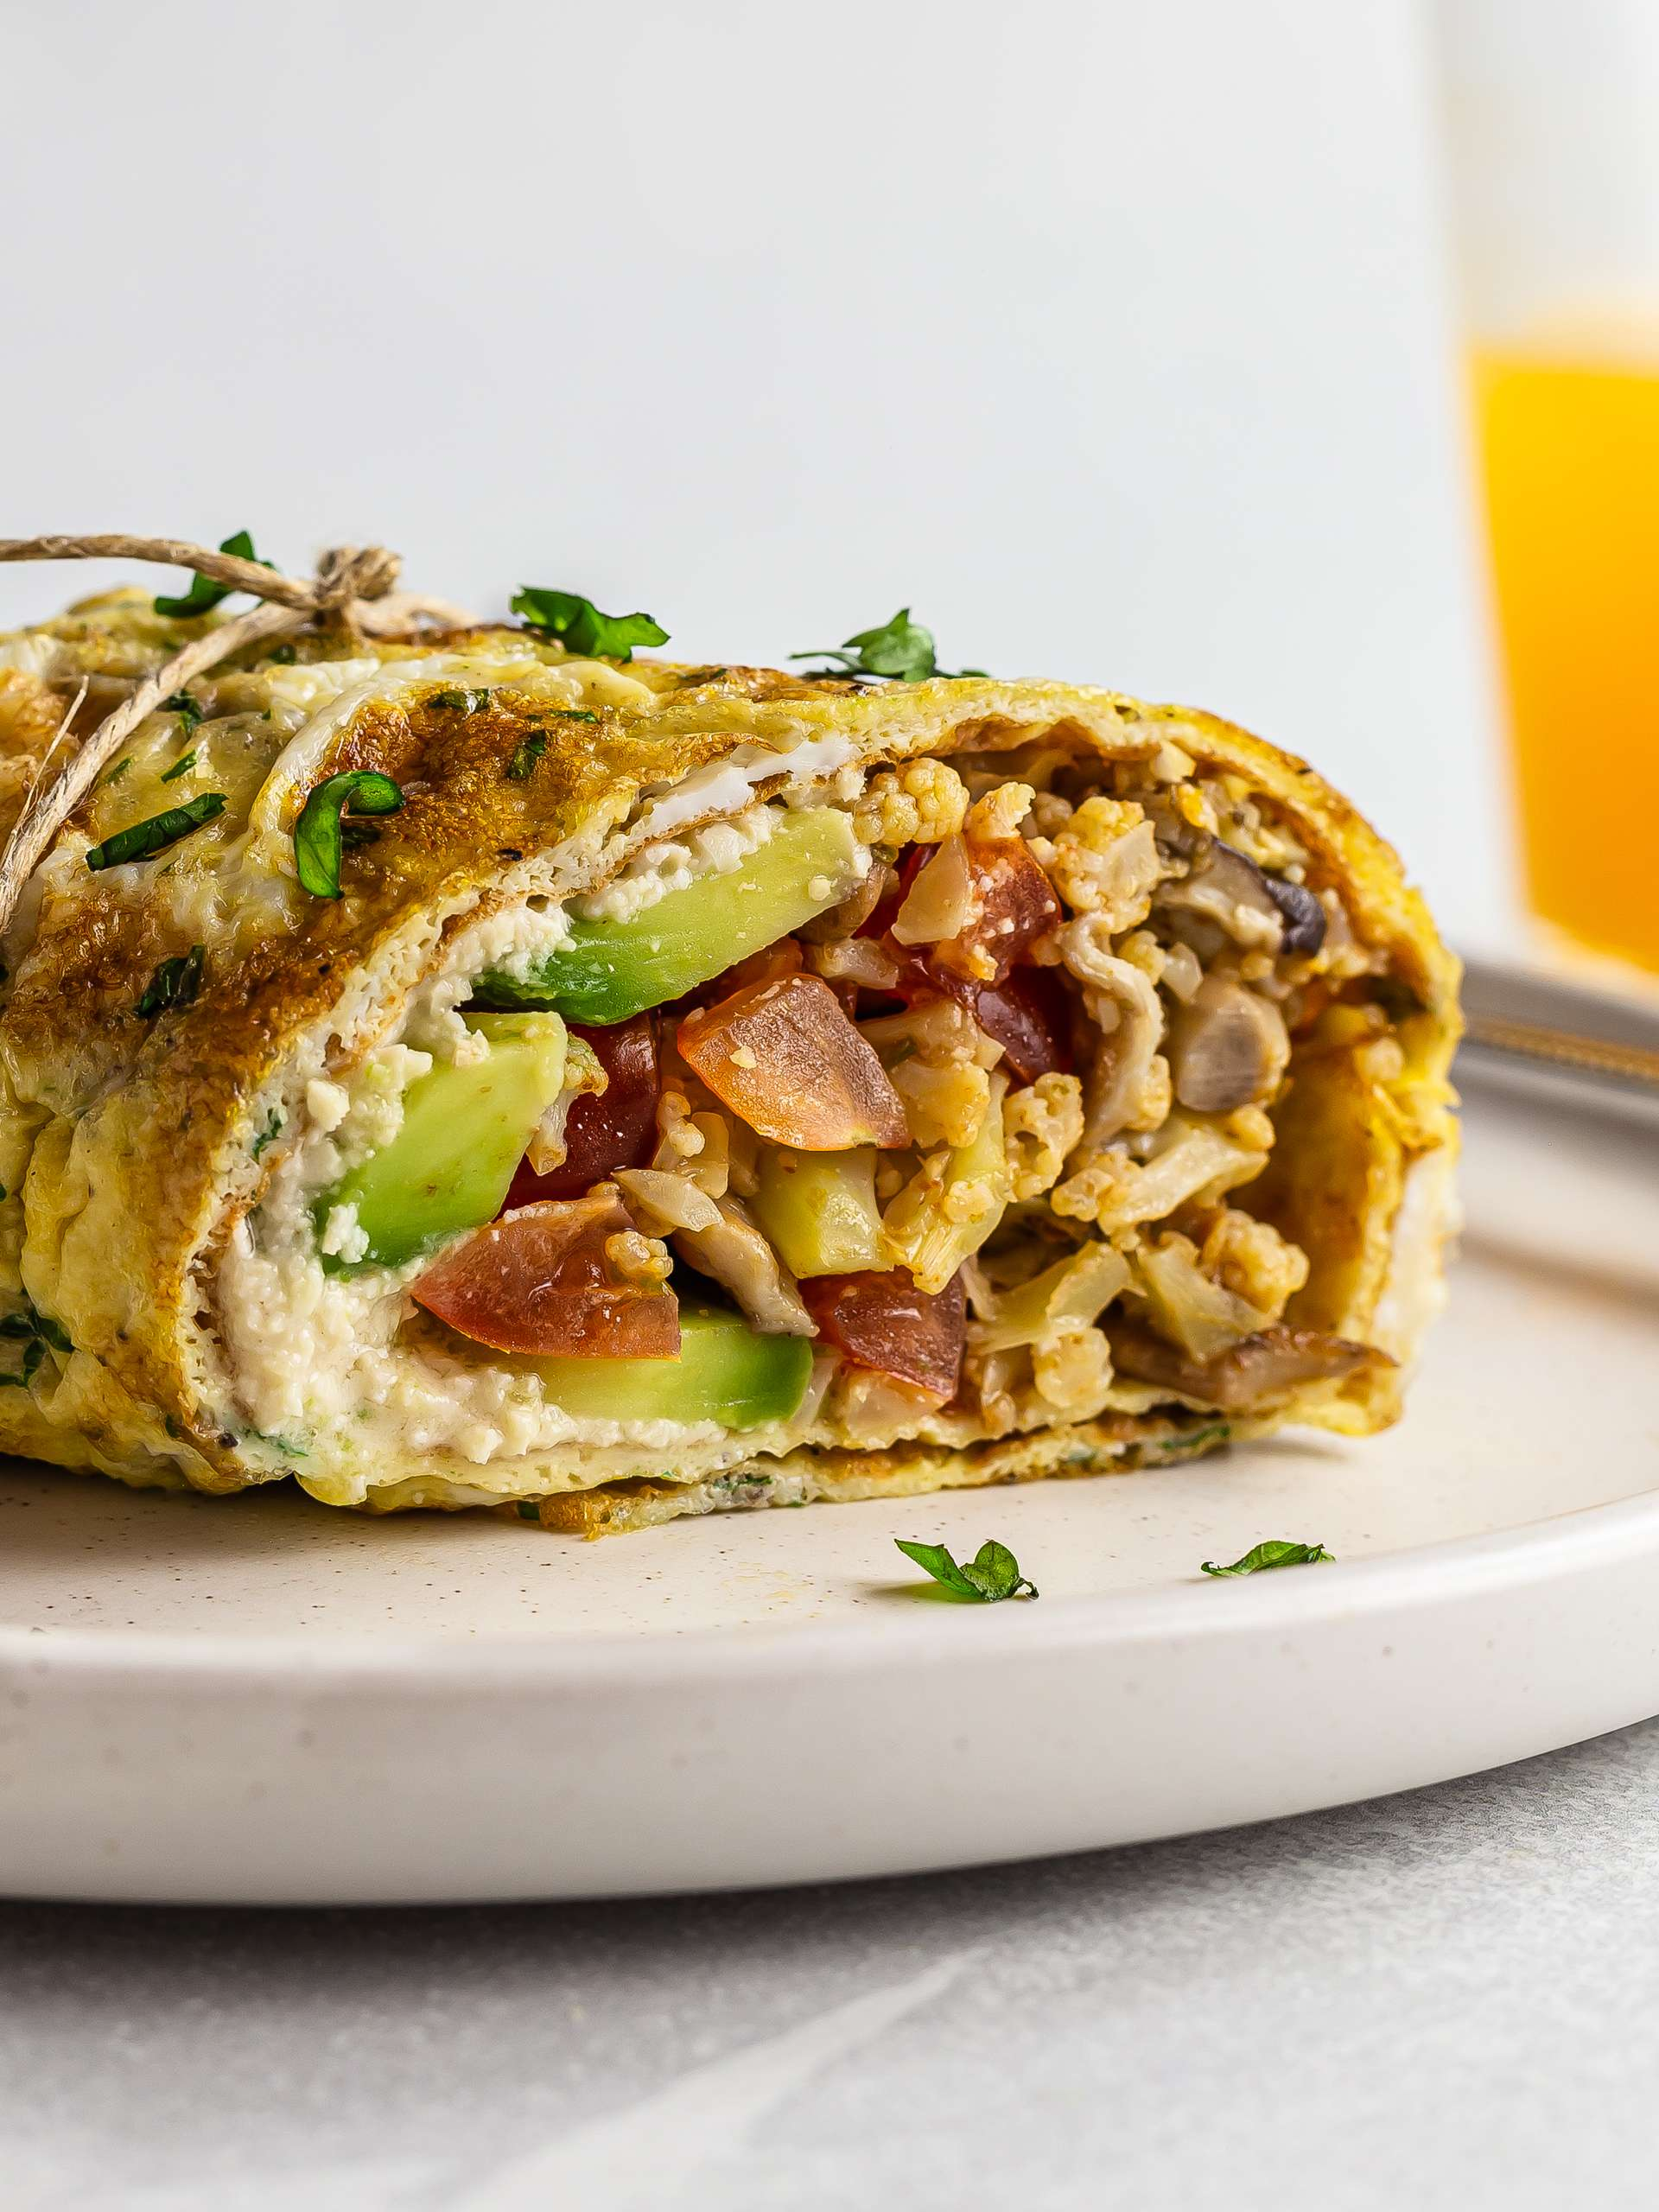 Keto Breakfast Burrito (Dairy-Free)